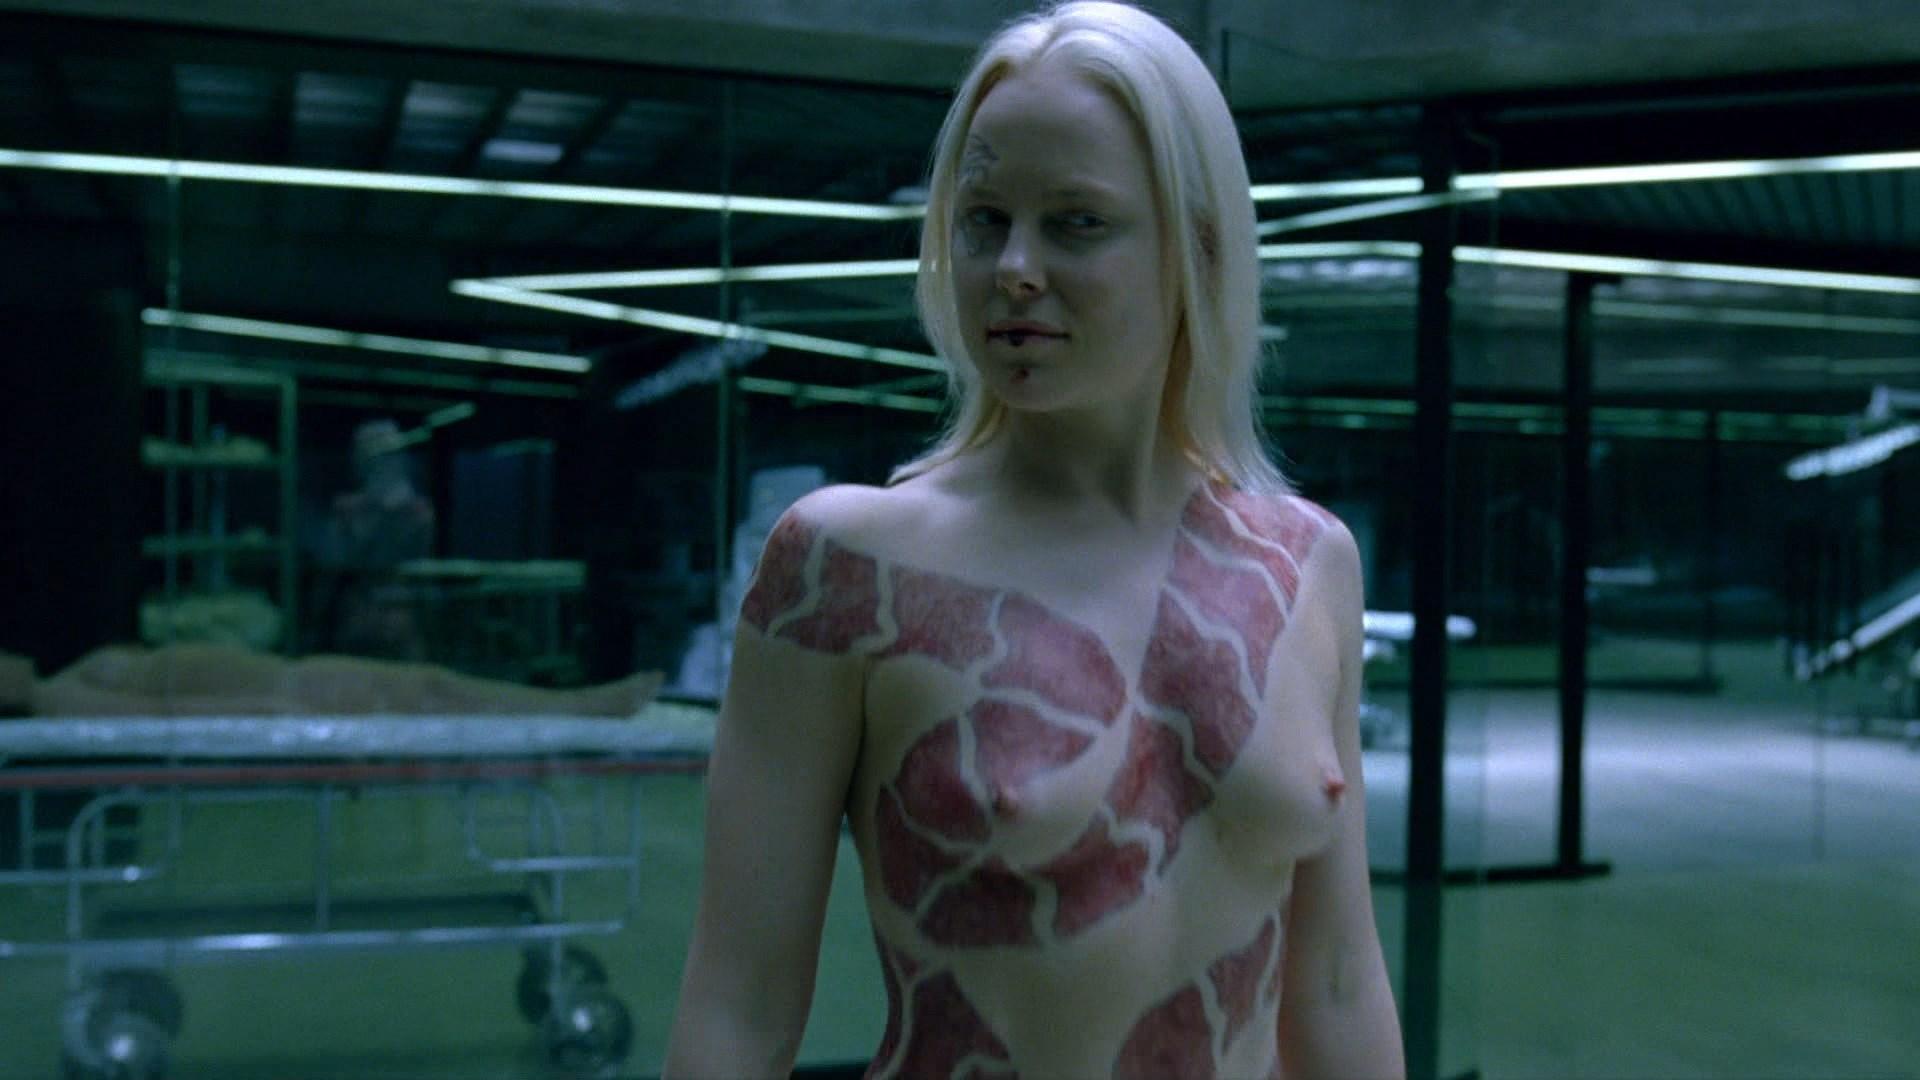 Ingrid Bolsø Berdal Naked ingrid bolsø berdal nude photos and videos | #thefappening